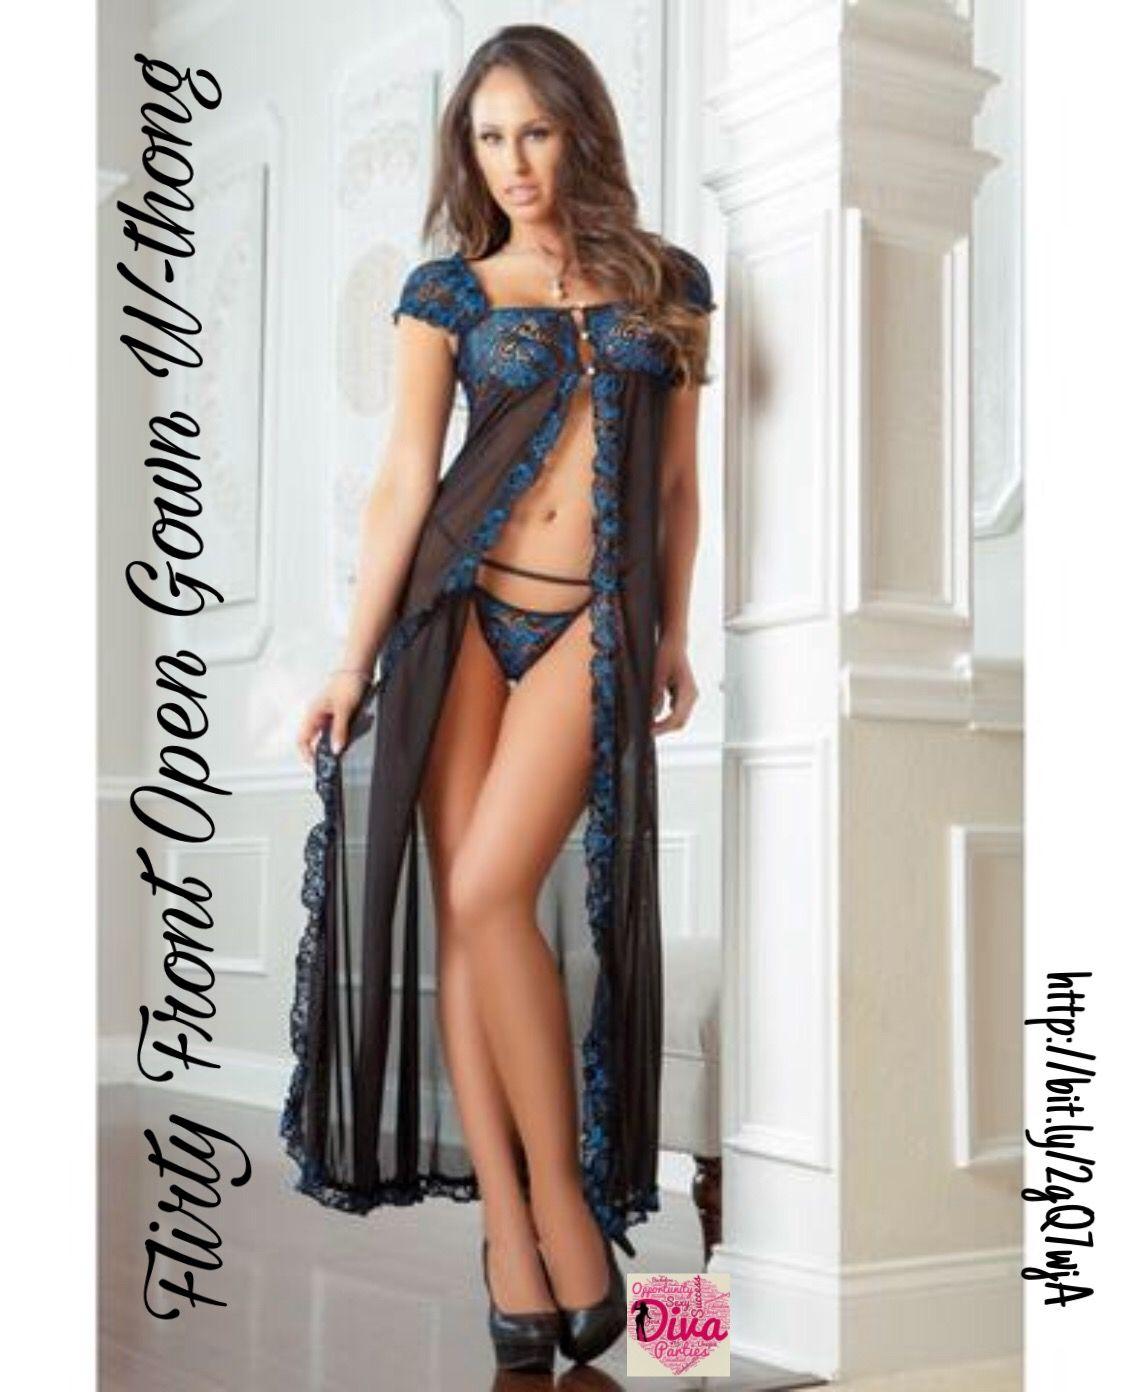 Sexy diva lingerie